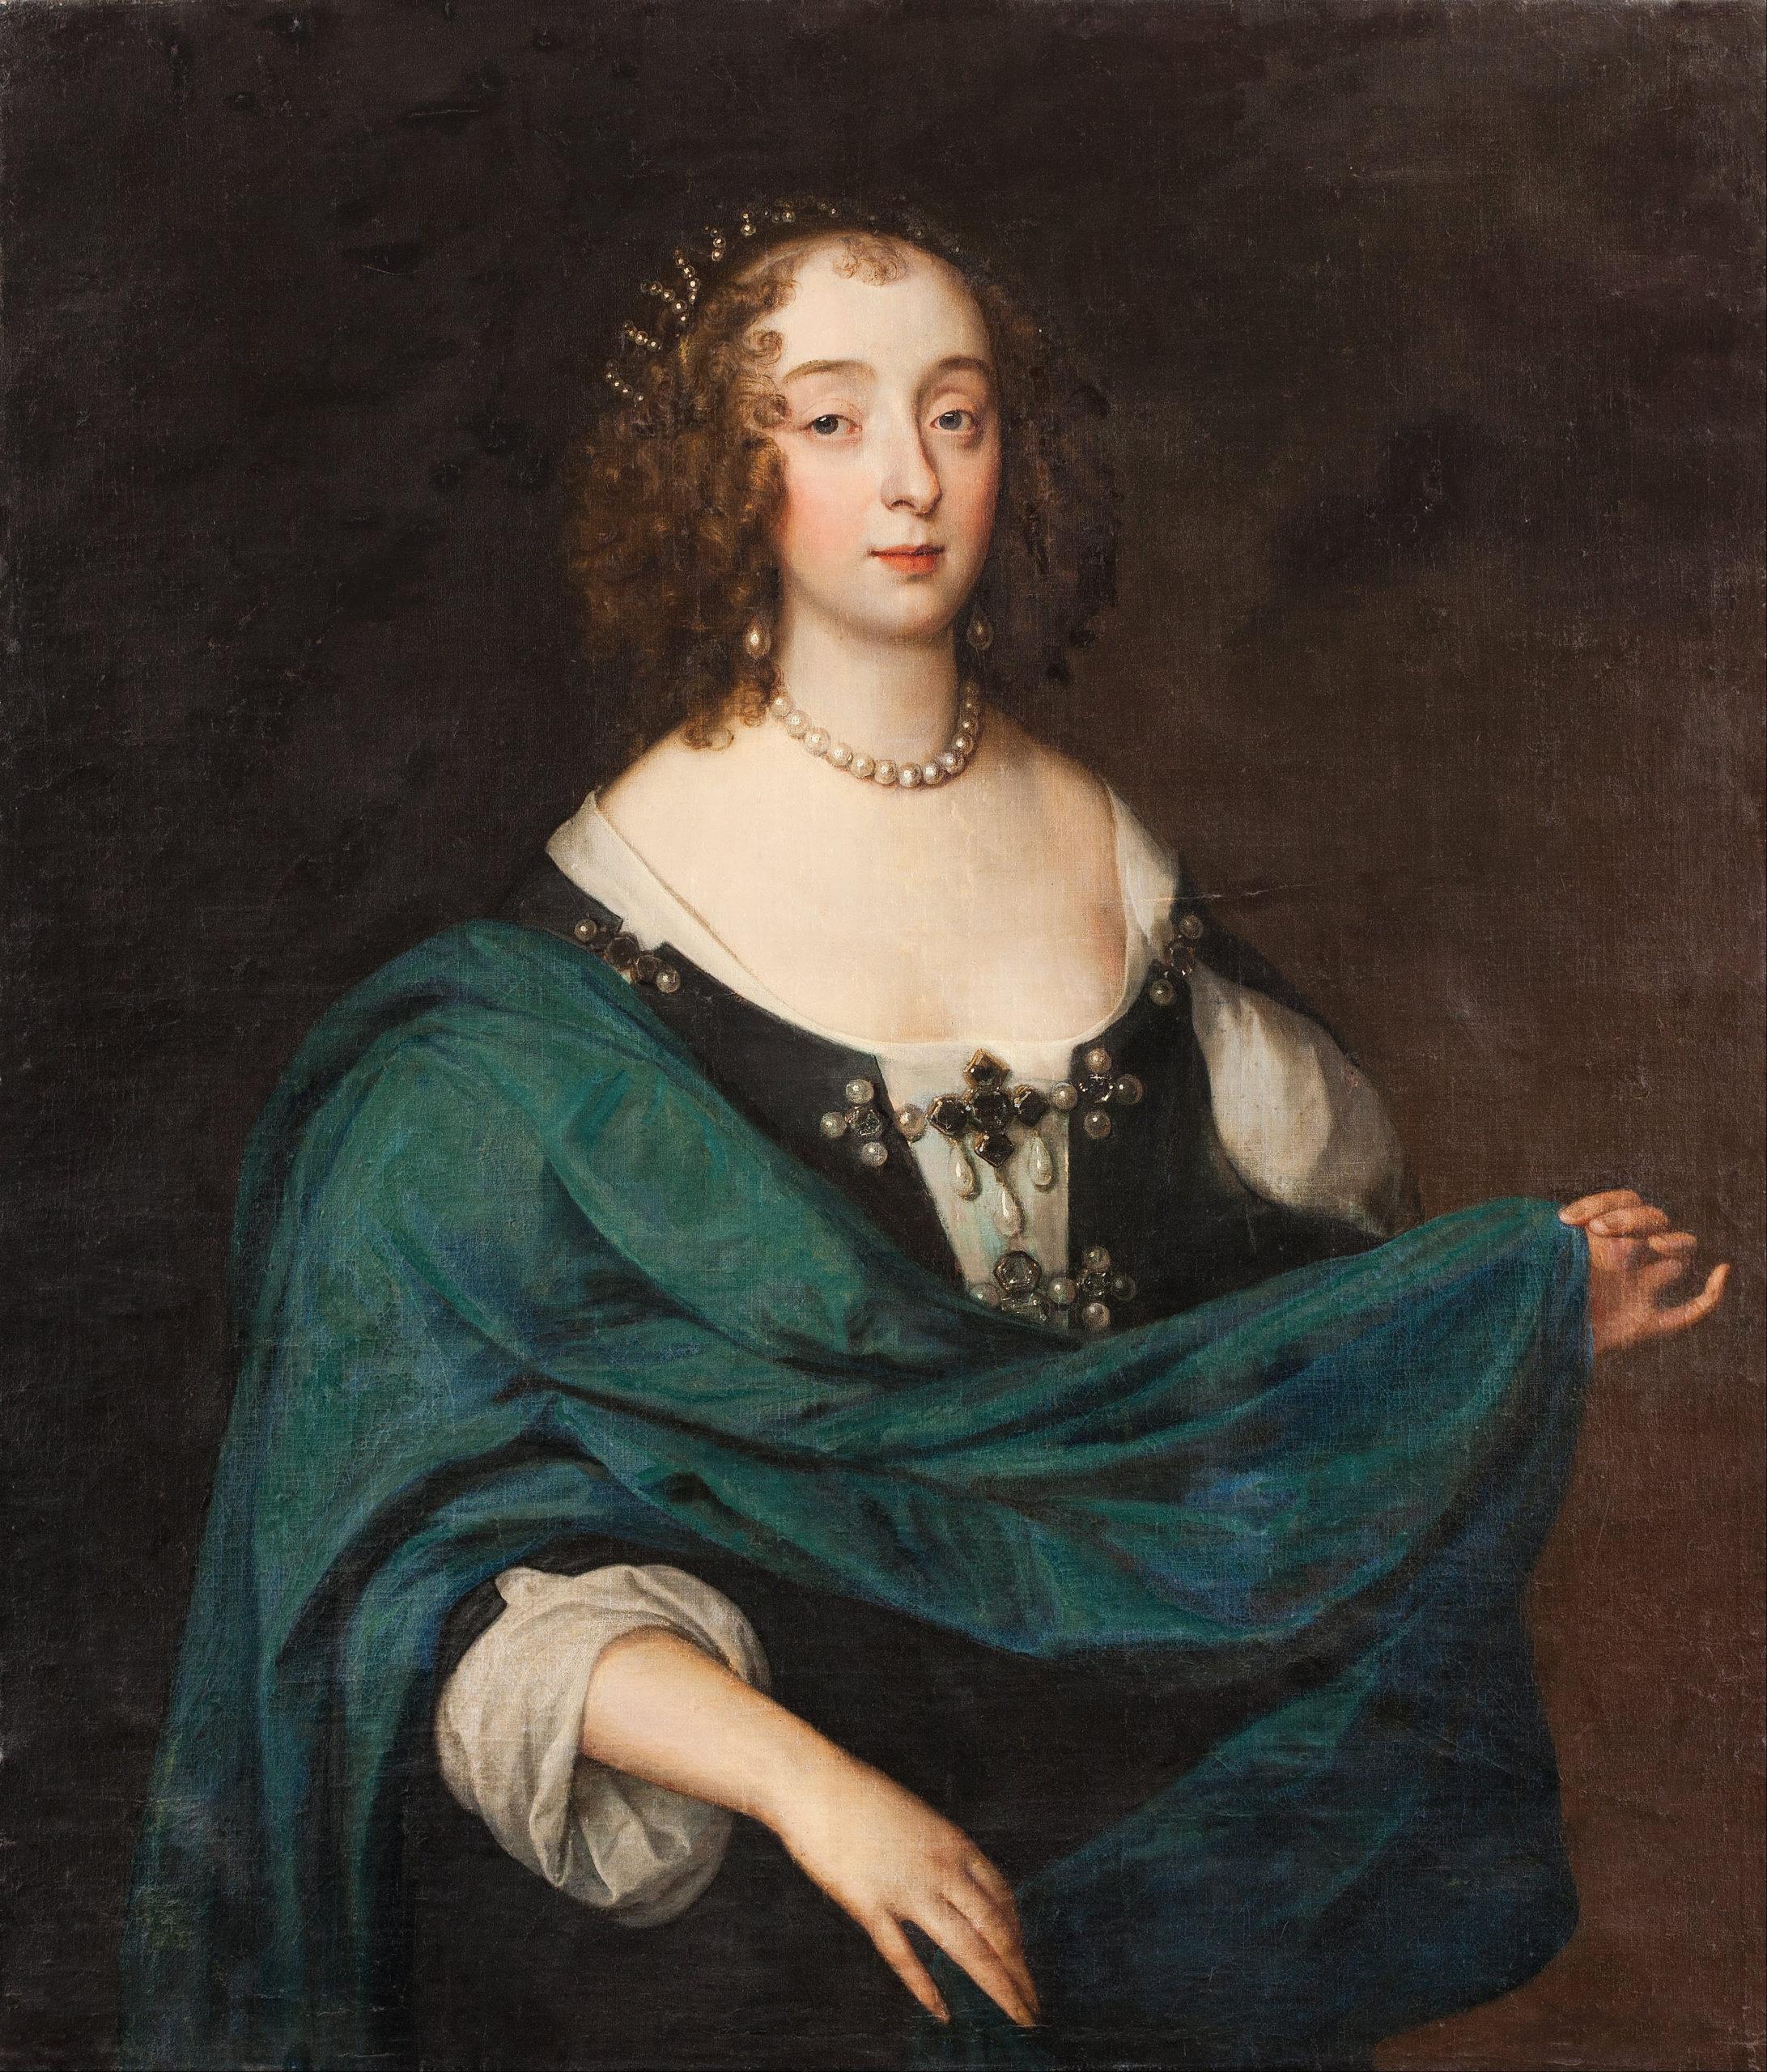 Mary_Villiers,_Duchess_of_Richmond_and_Lennox_(1622_–_85)_-_Google_Art_Project